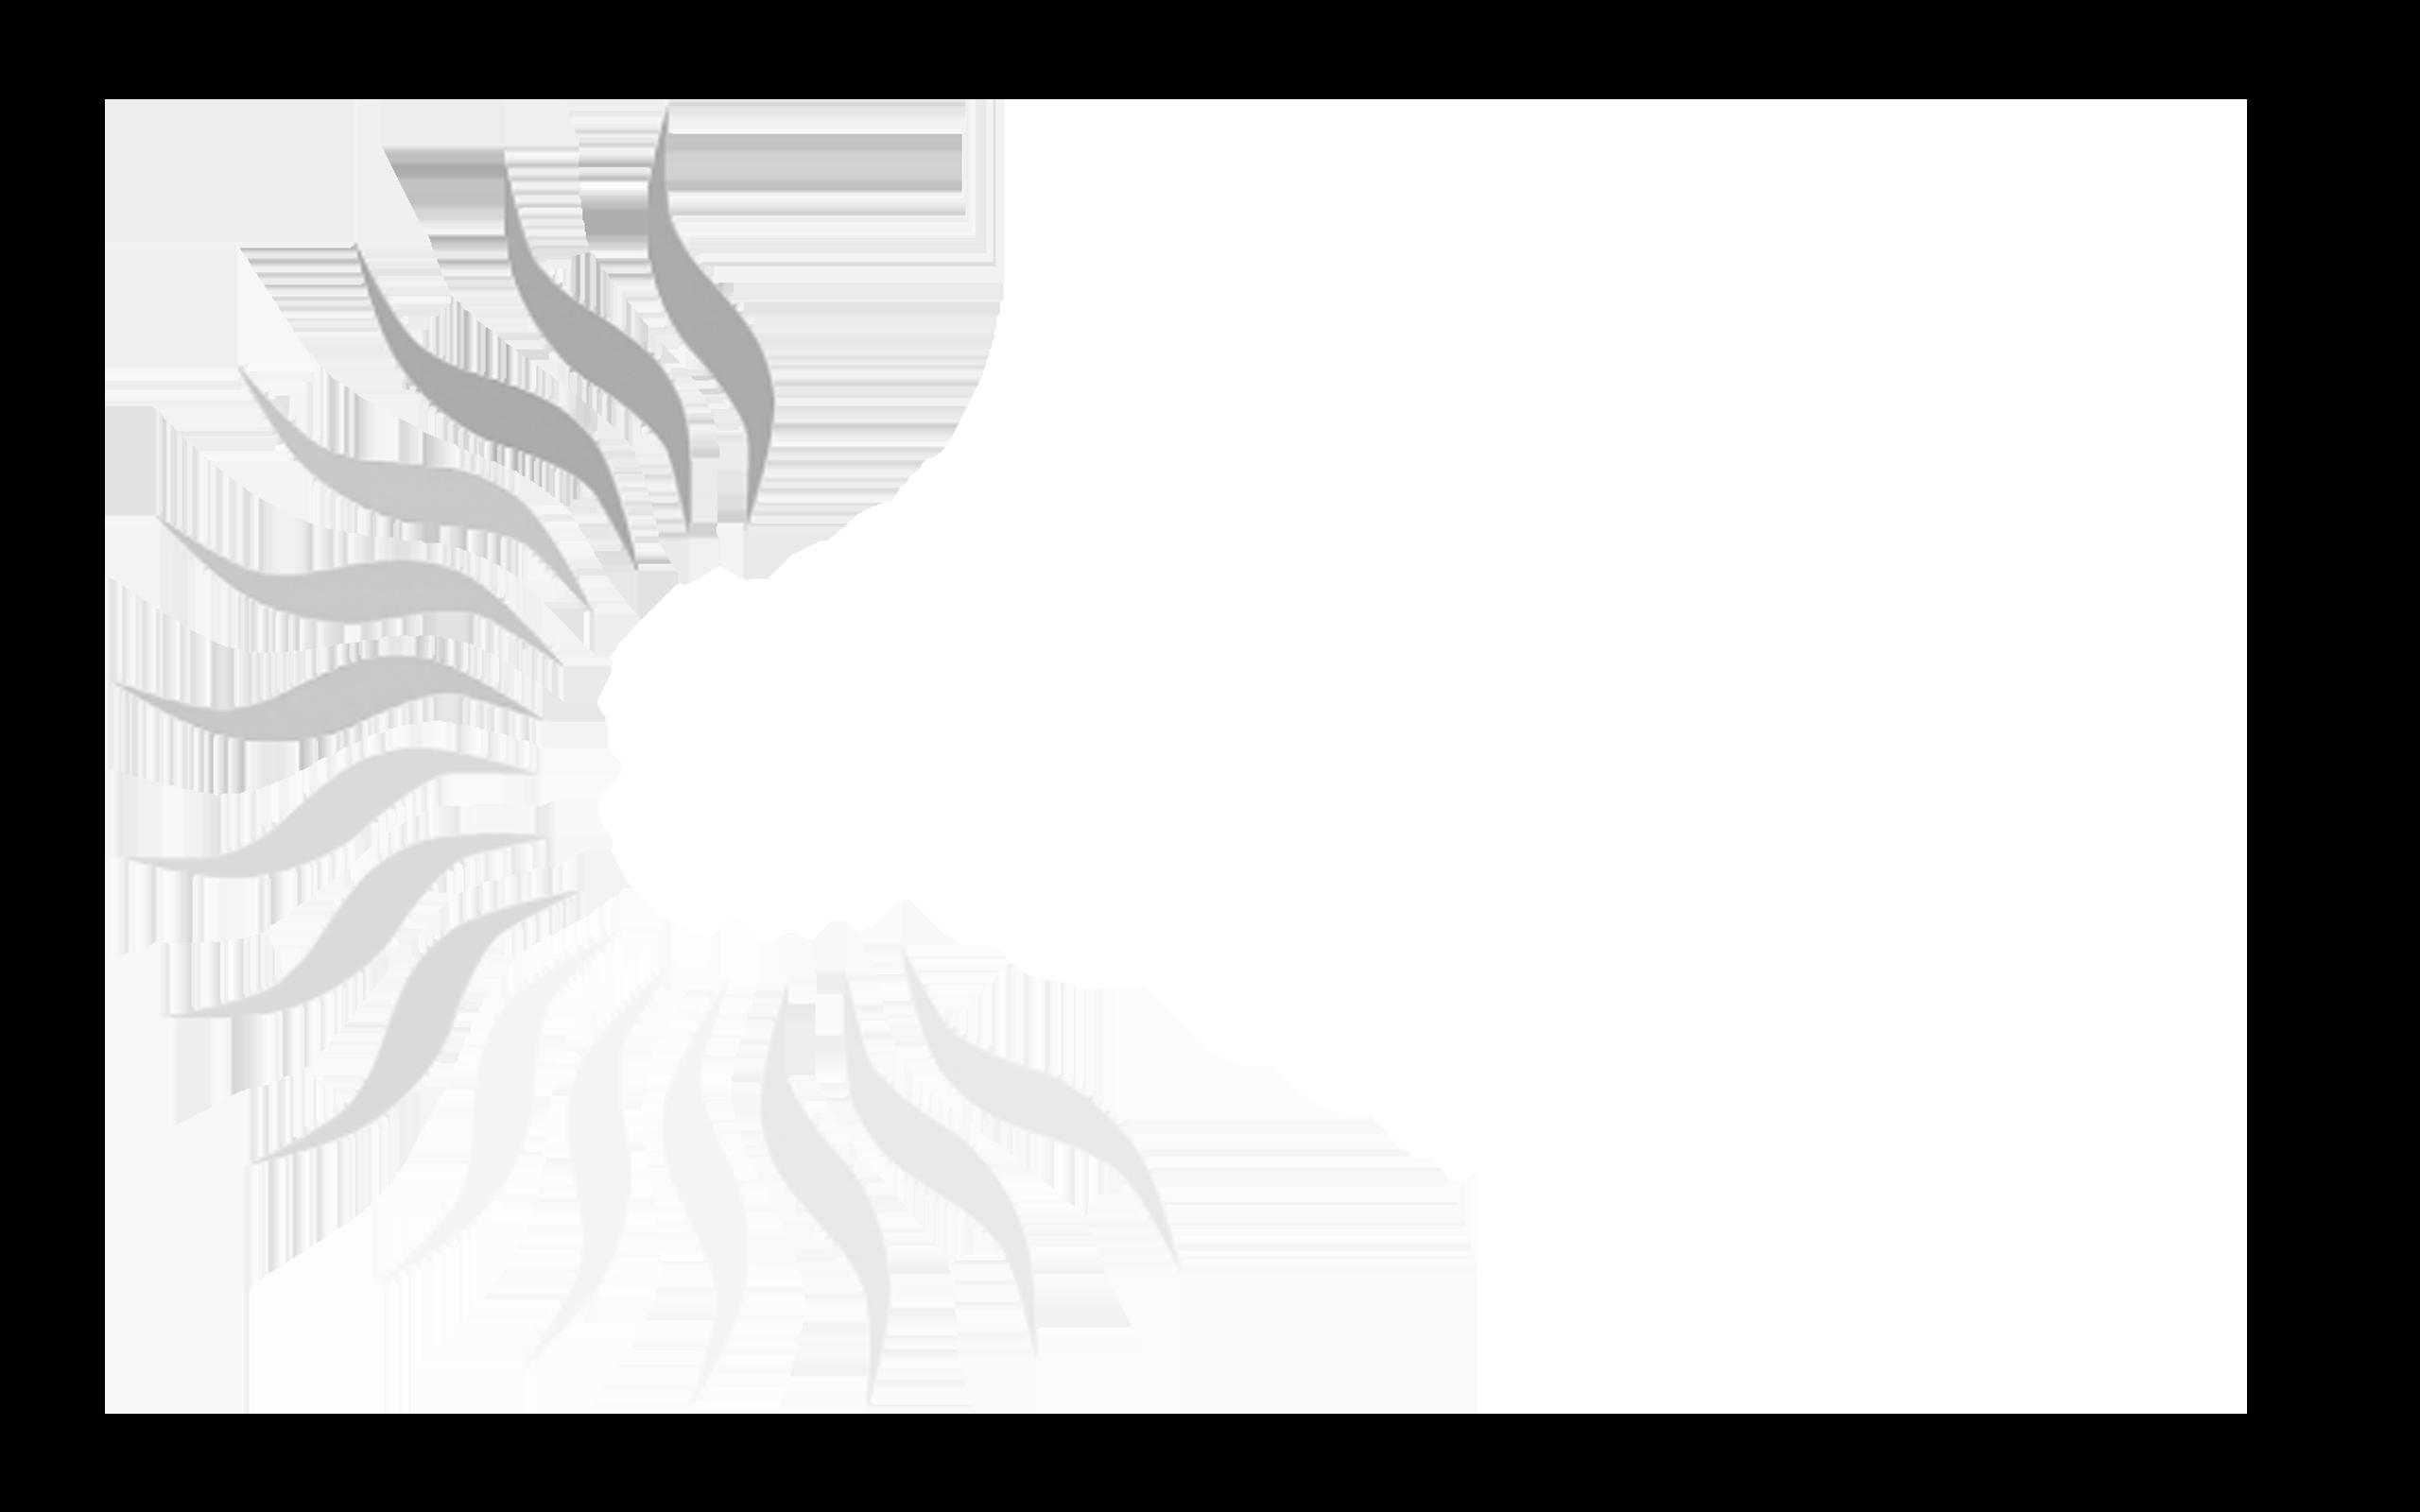 Apt Servizi regione Emilia Romagna